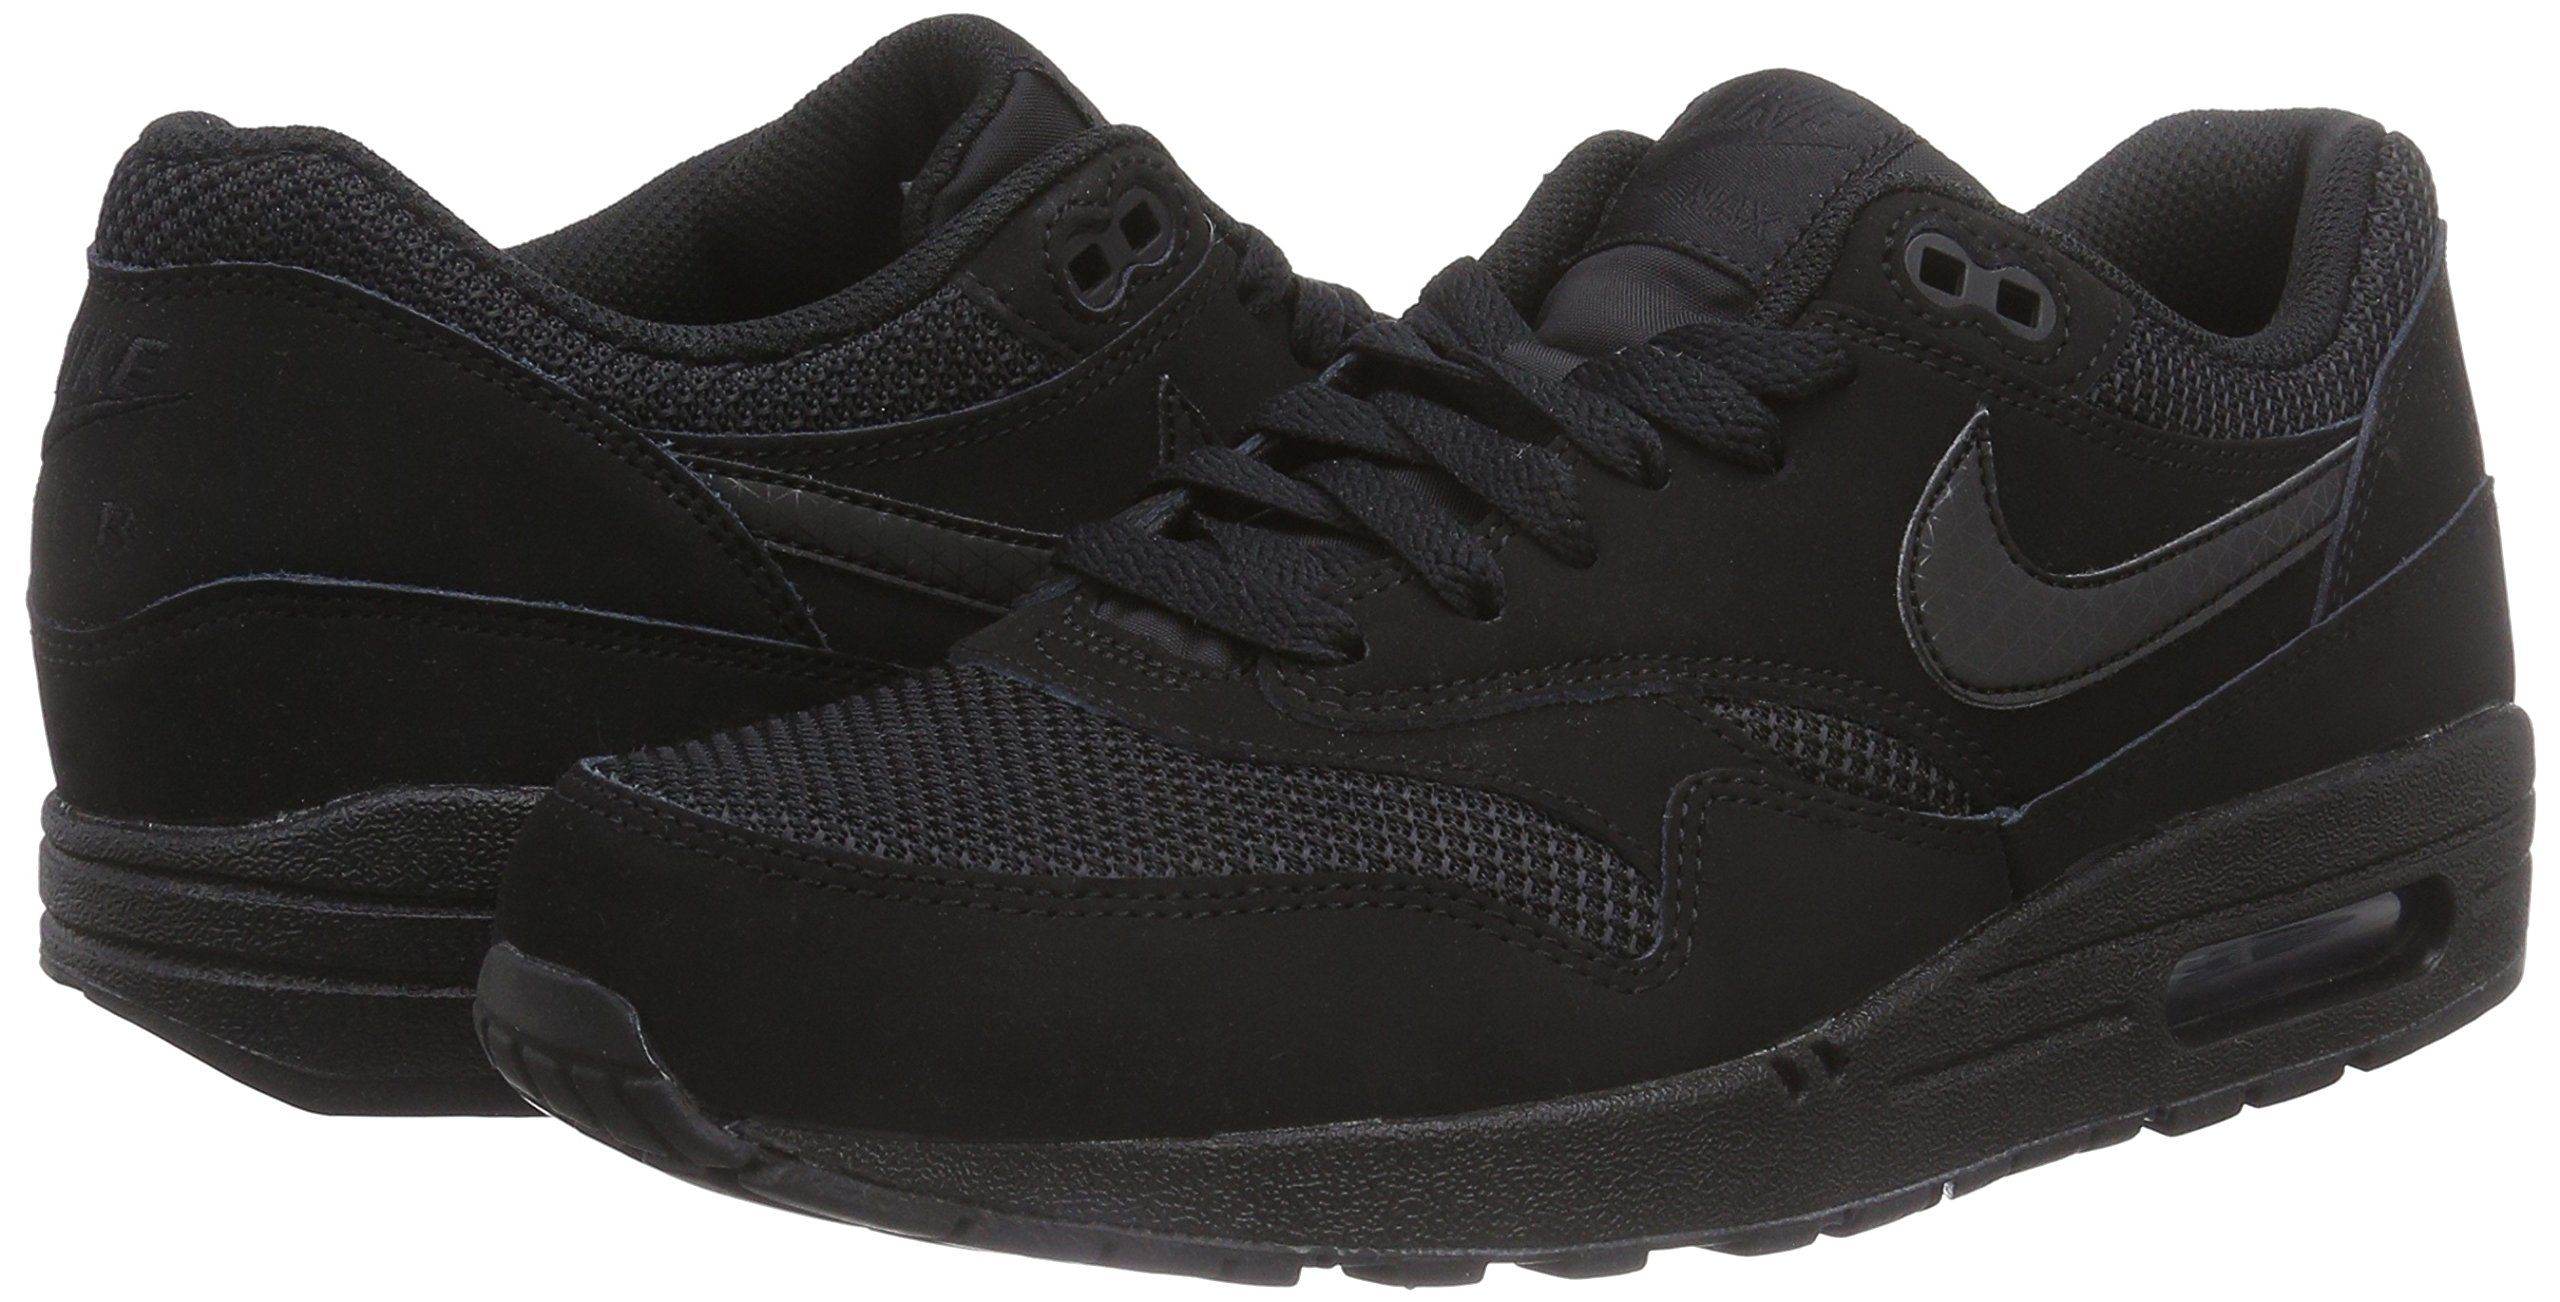 brand new 19eb0 7b1dd Nike Men s Air Max 1 Essential Black 537383-020 Black (SIZE  9)